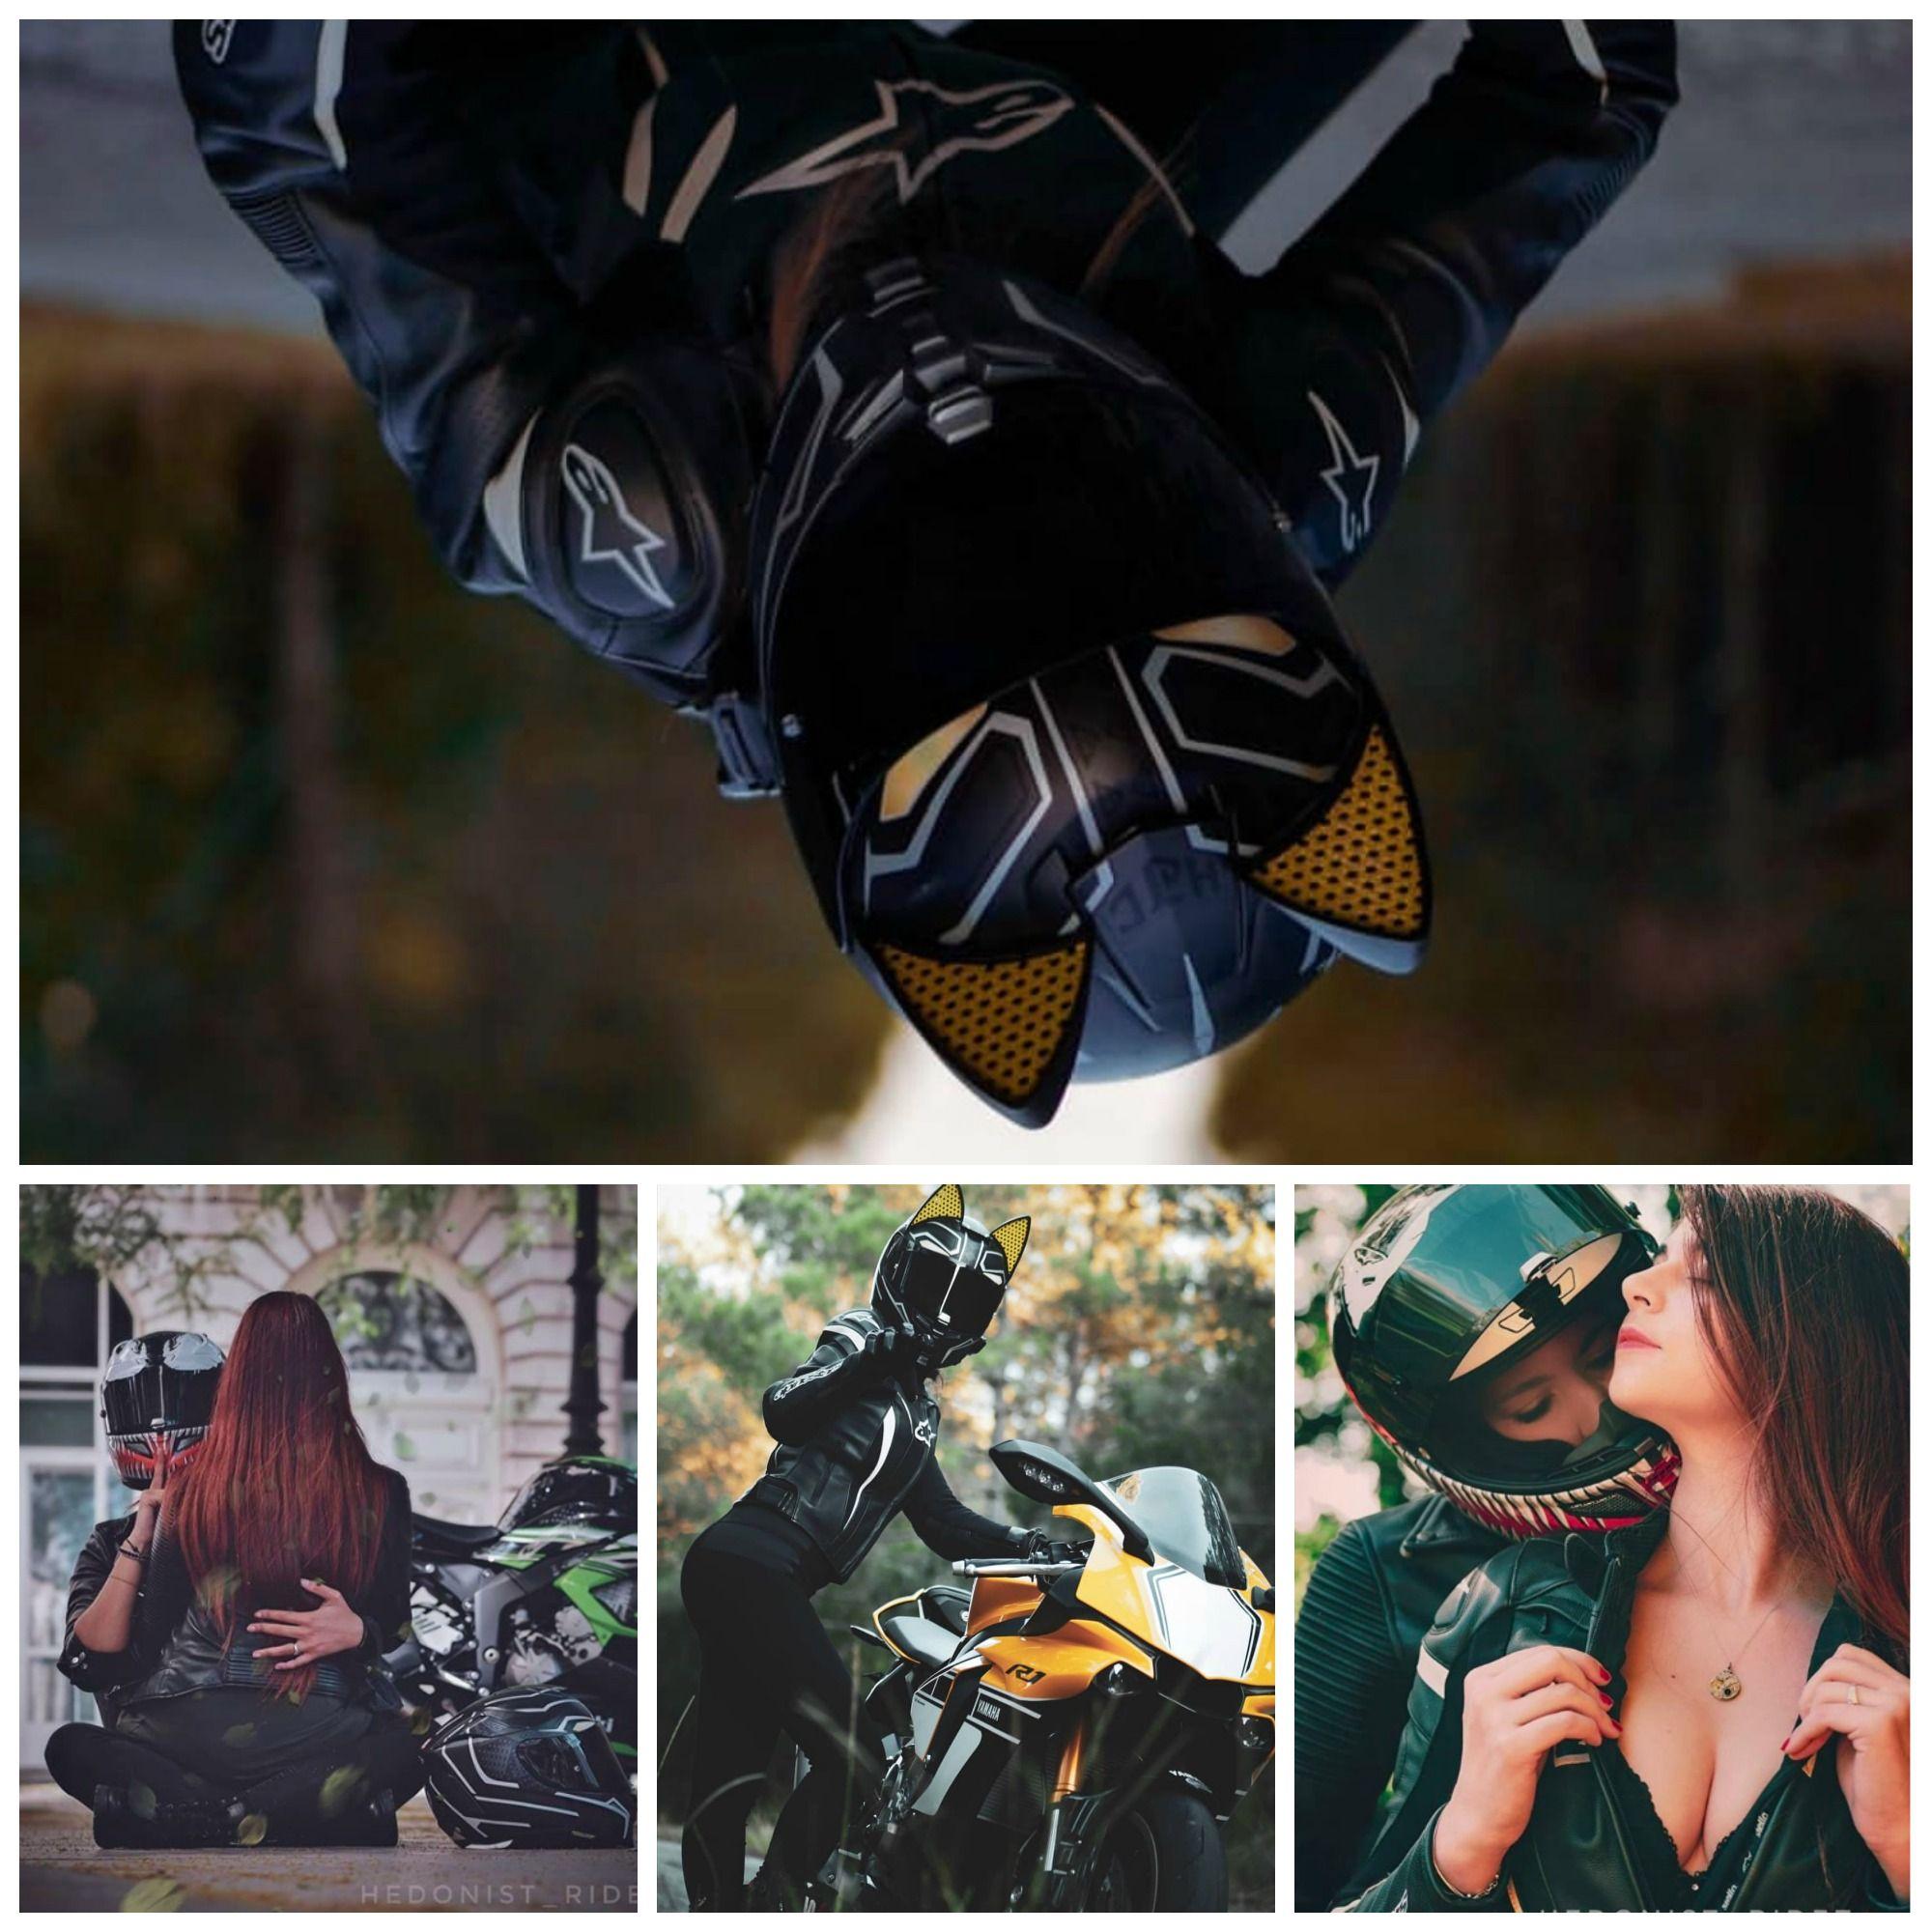 Black Panther HJC RPHA70 Cat Ear Helmet by hedonist_ridez